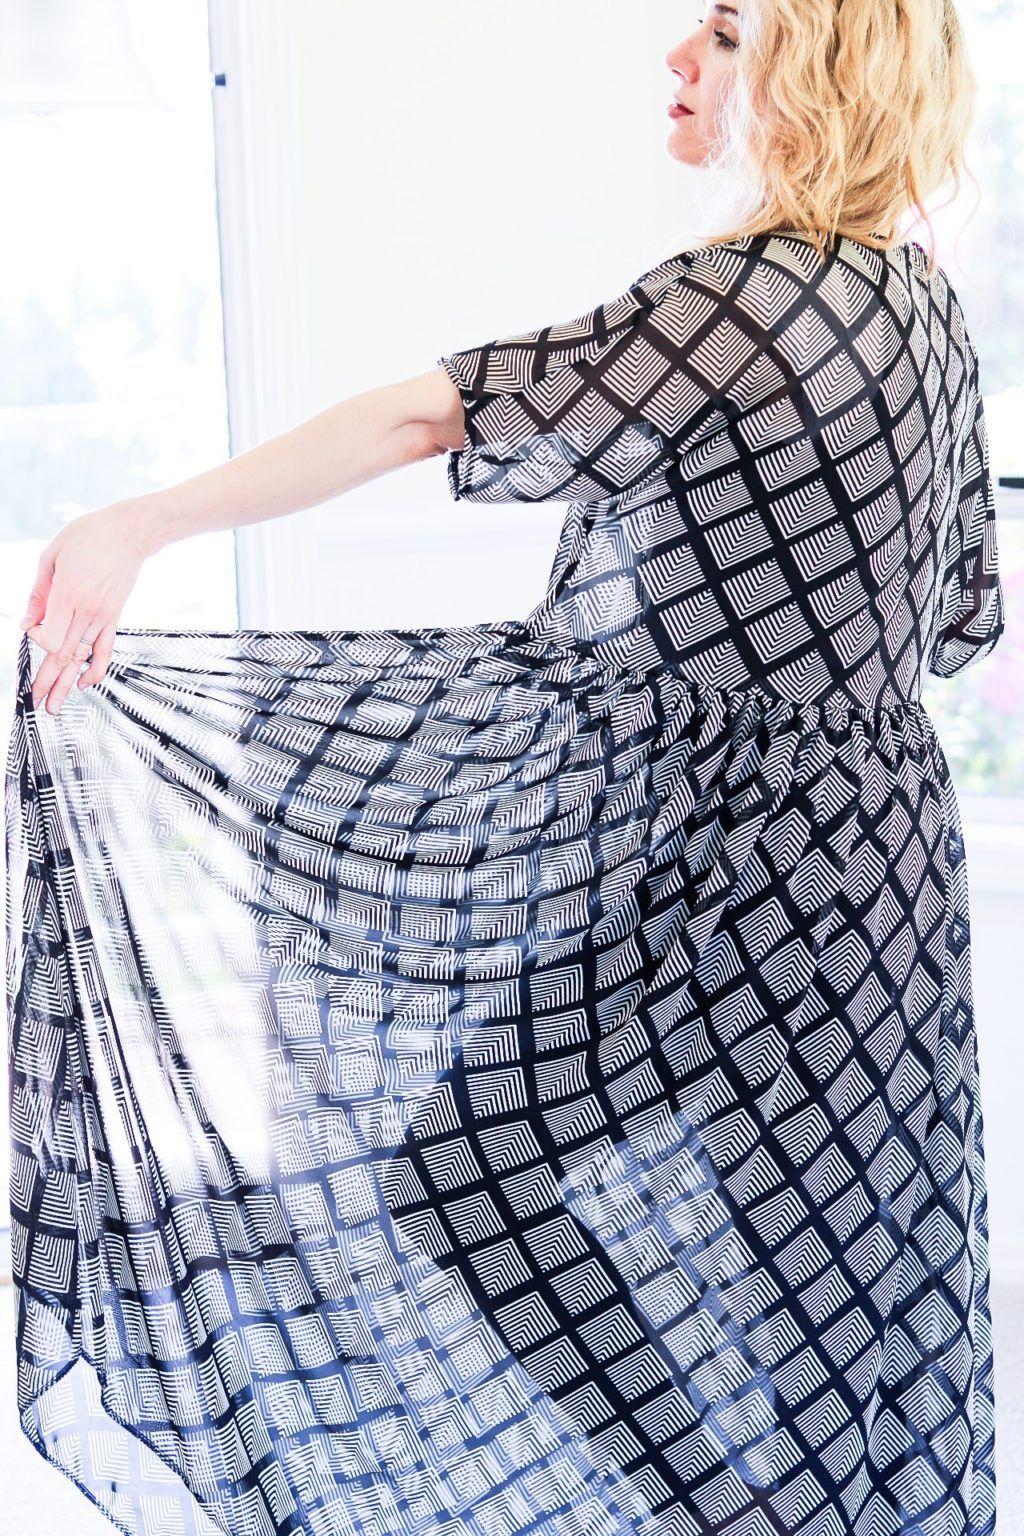 Dreamy summer diy maxi dress dress tutorials summer and tutorials